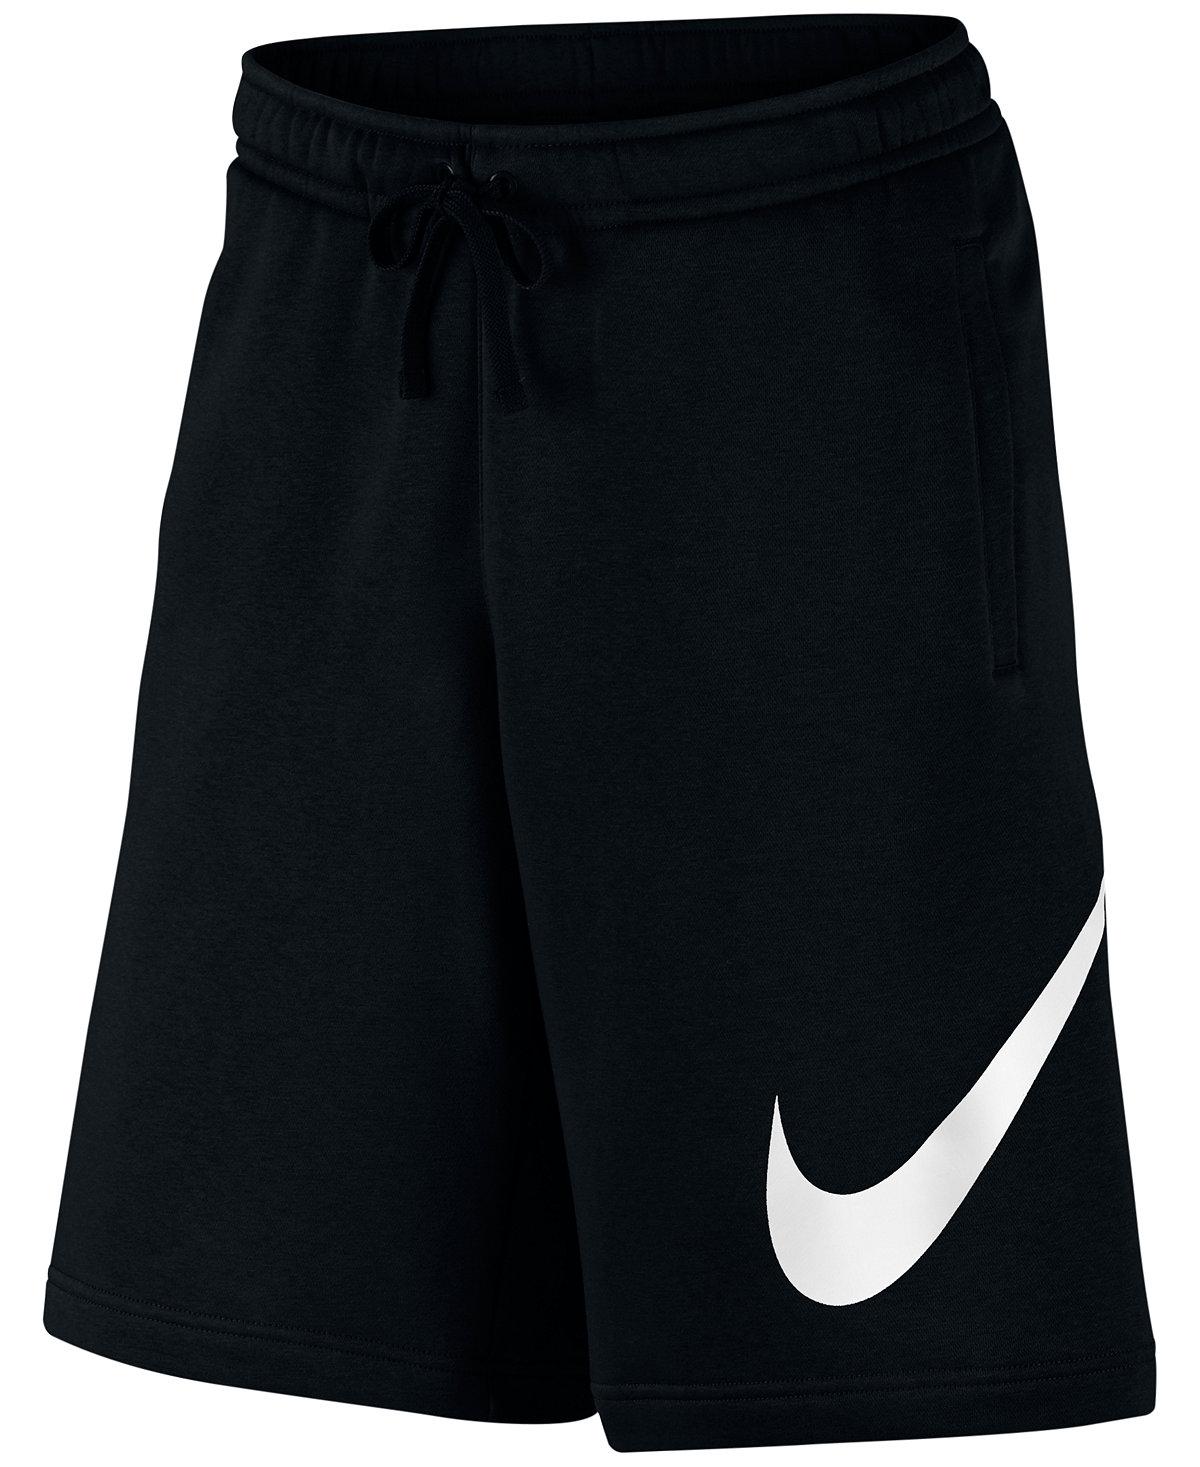 Save 14% On Nike Men's Club Fleece Shorts